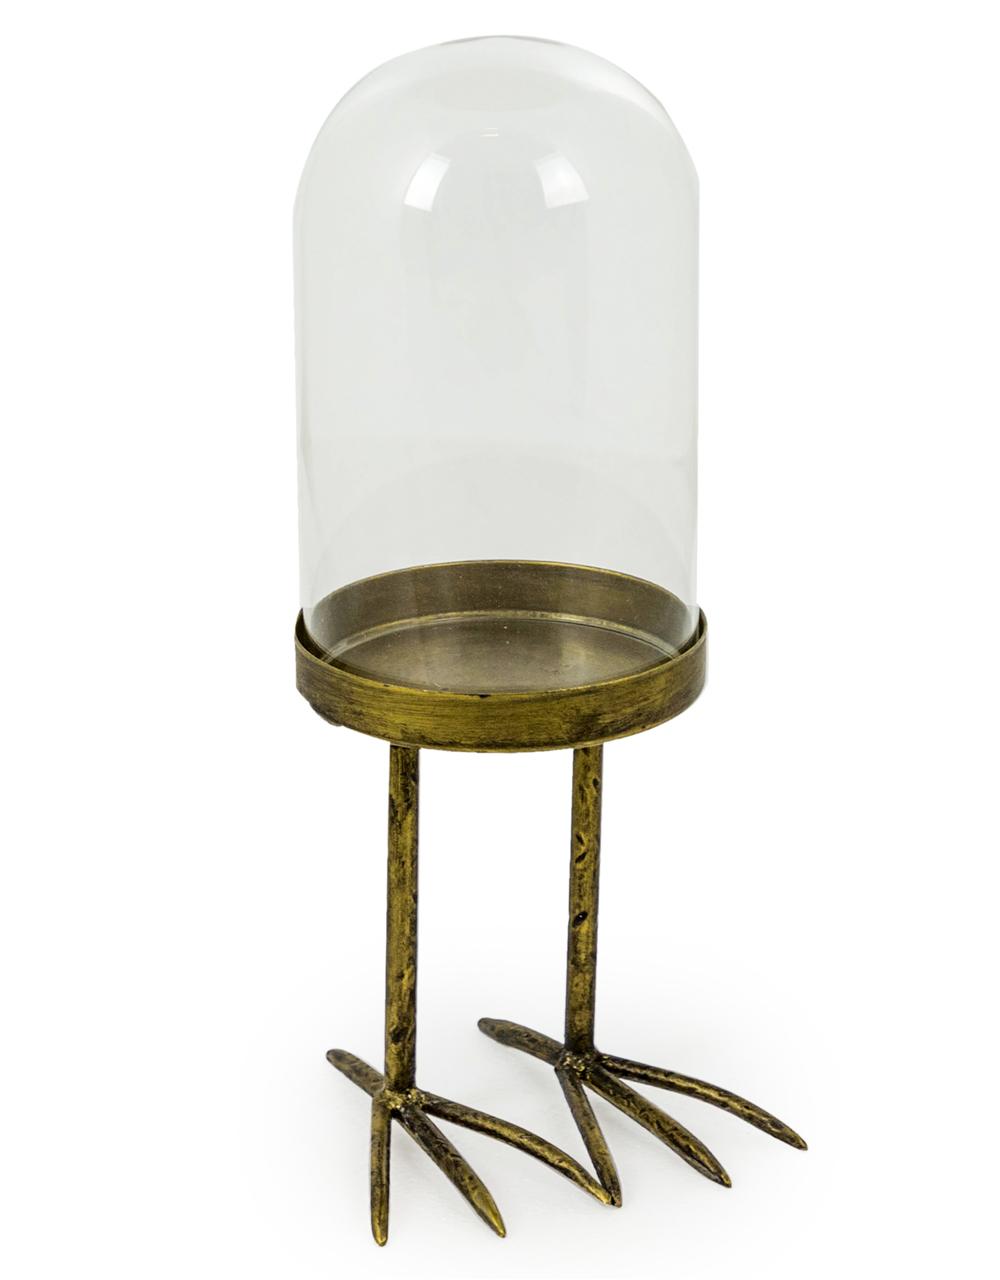 Small Glass Dome on Metal Bird Feet Base